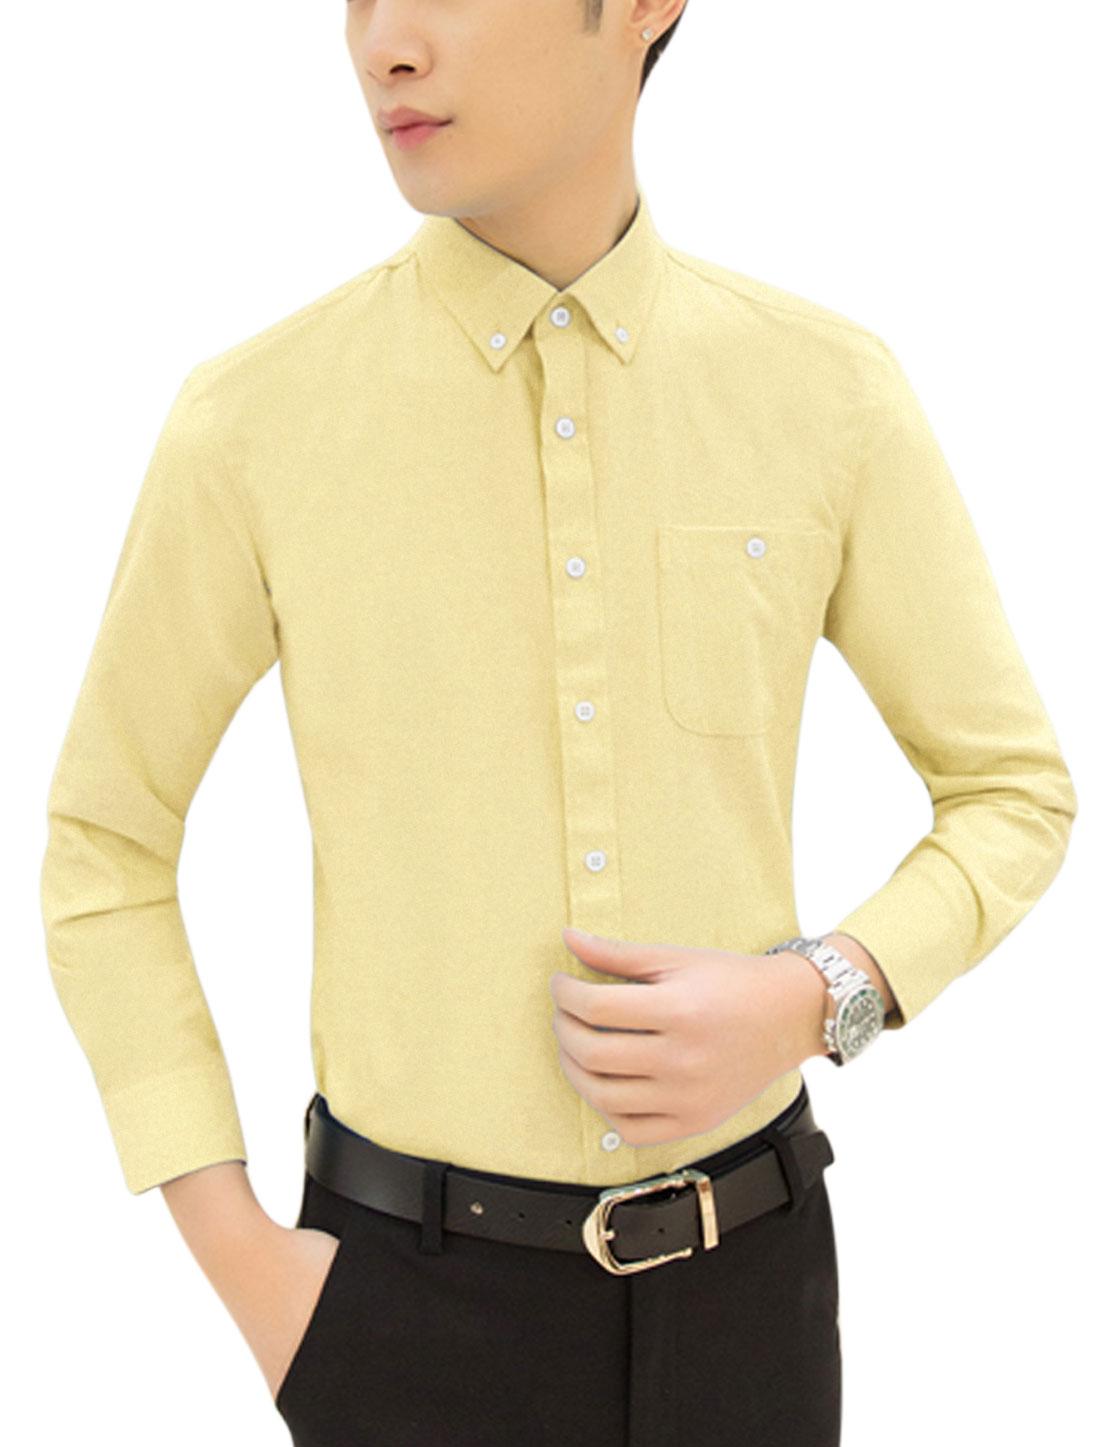 Men Long Sleeve Point Collar Button Down Top Shirts Light Yellow M